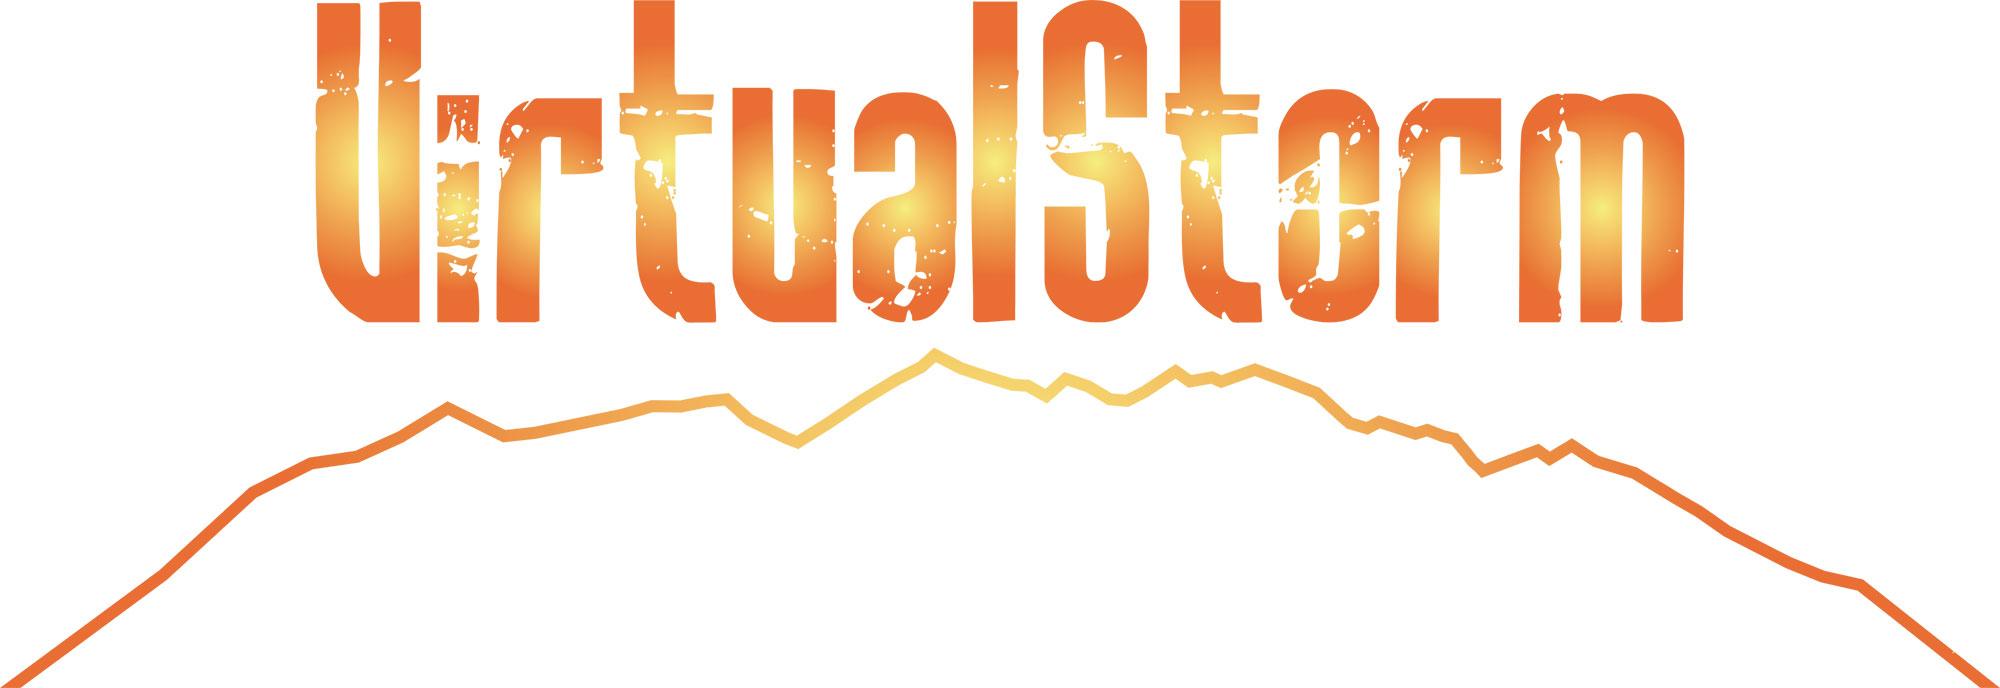 virtualstorm-line-mountains-white-bg.jpg